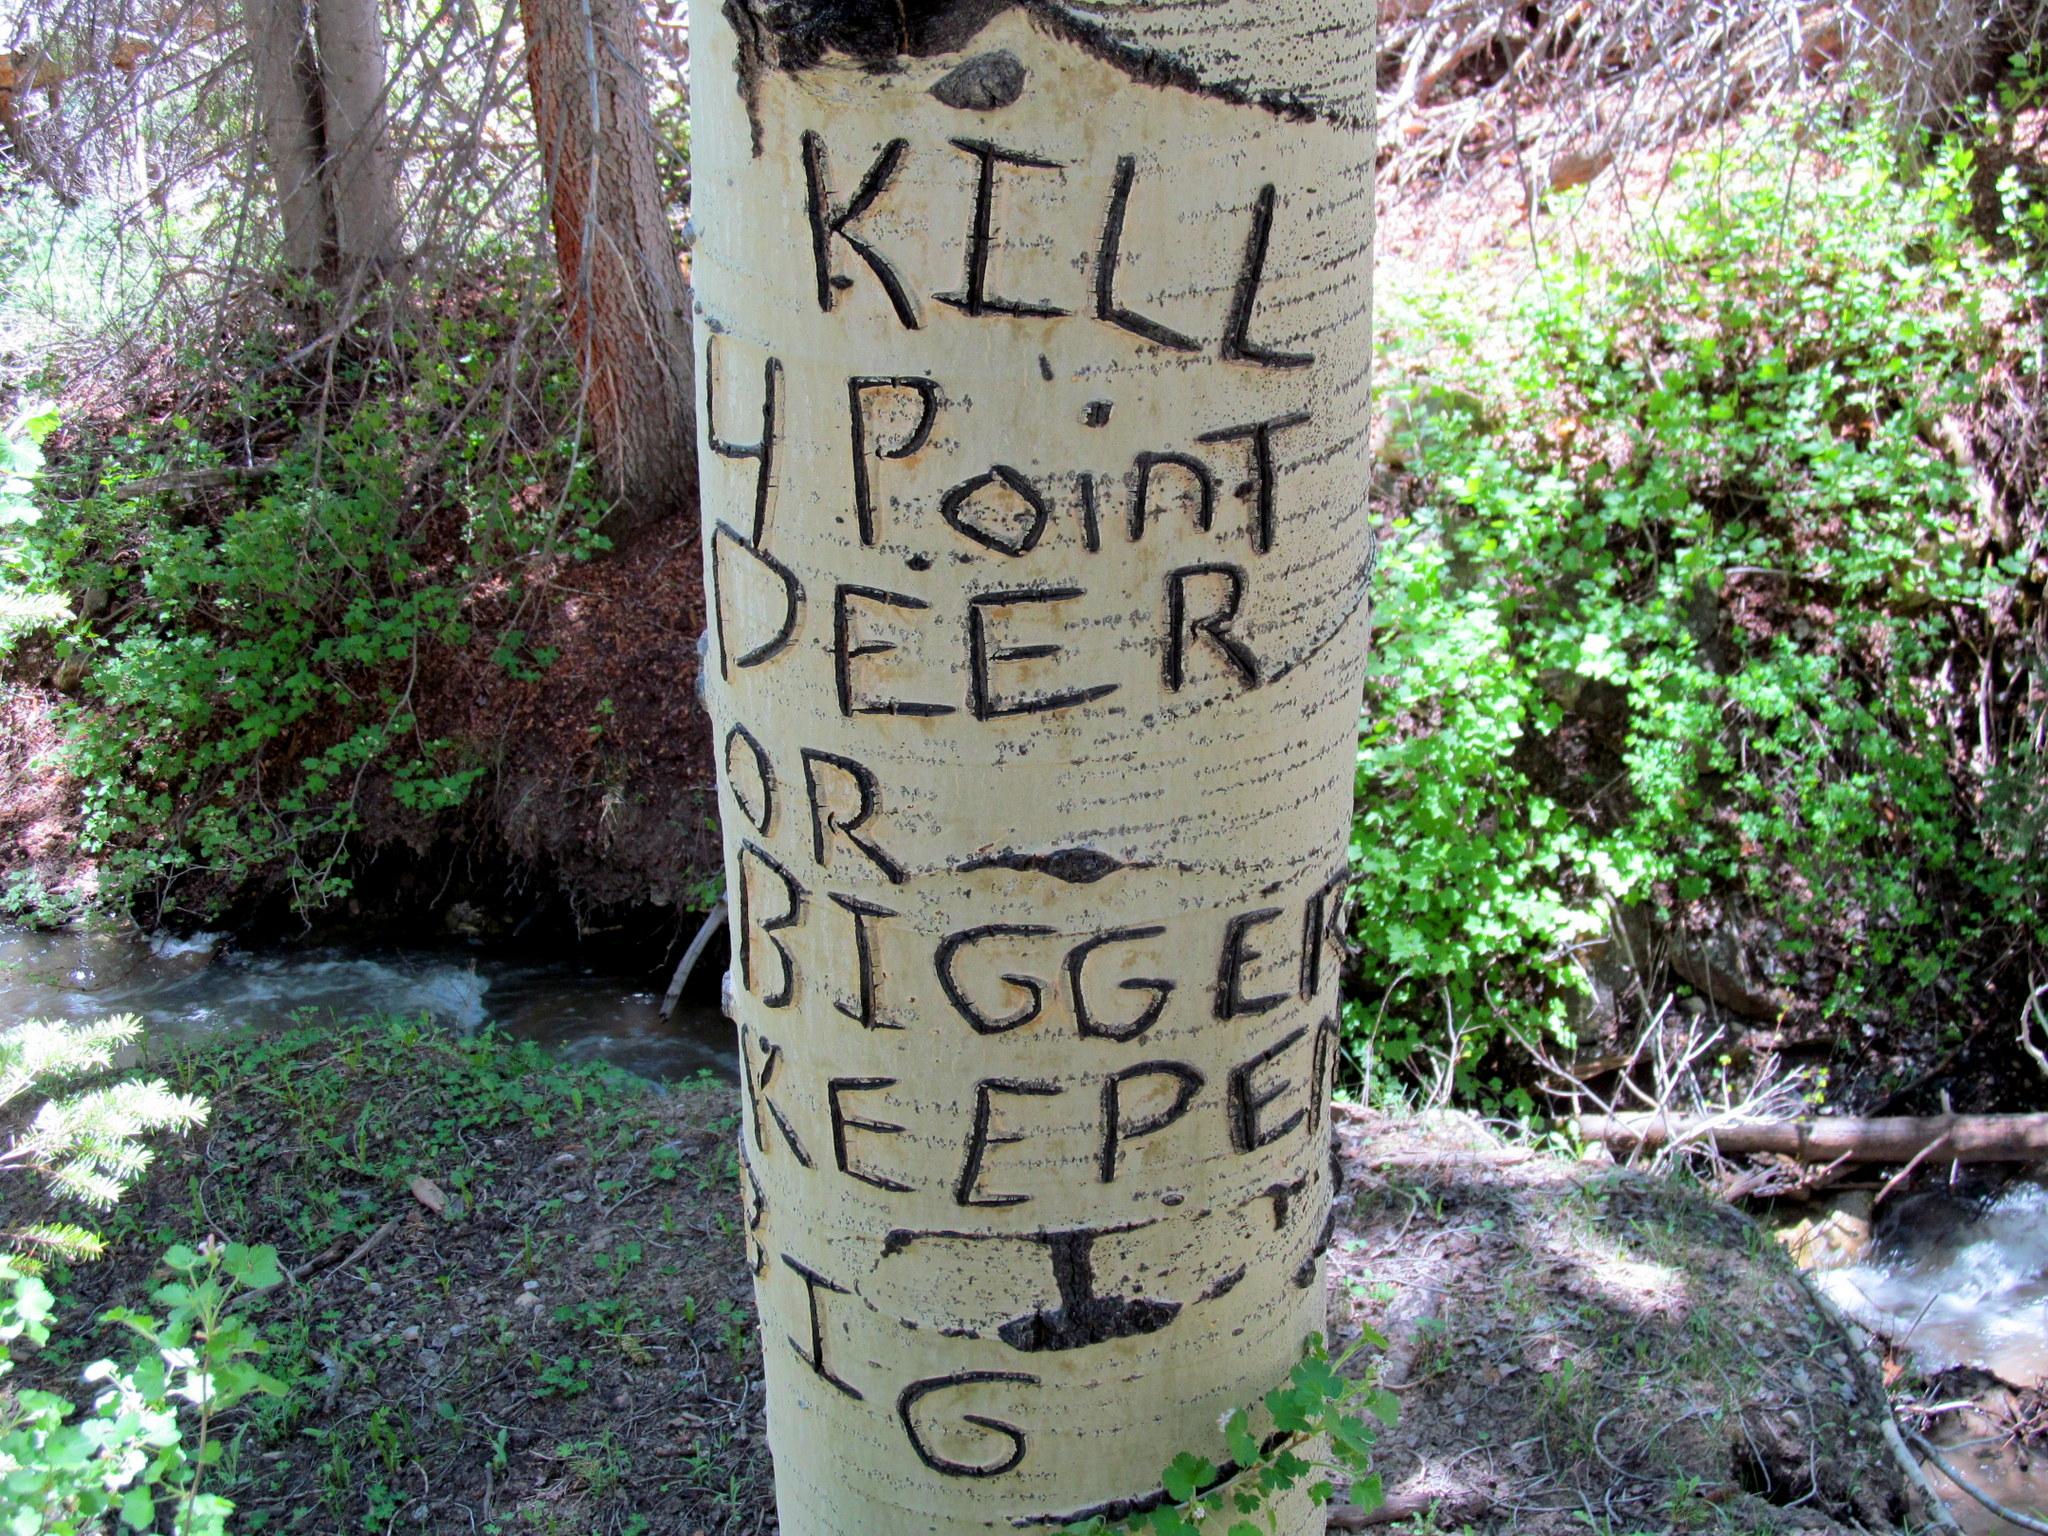 Photo: Kill 4 point deer or bigger, keepem big